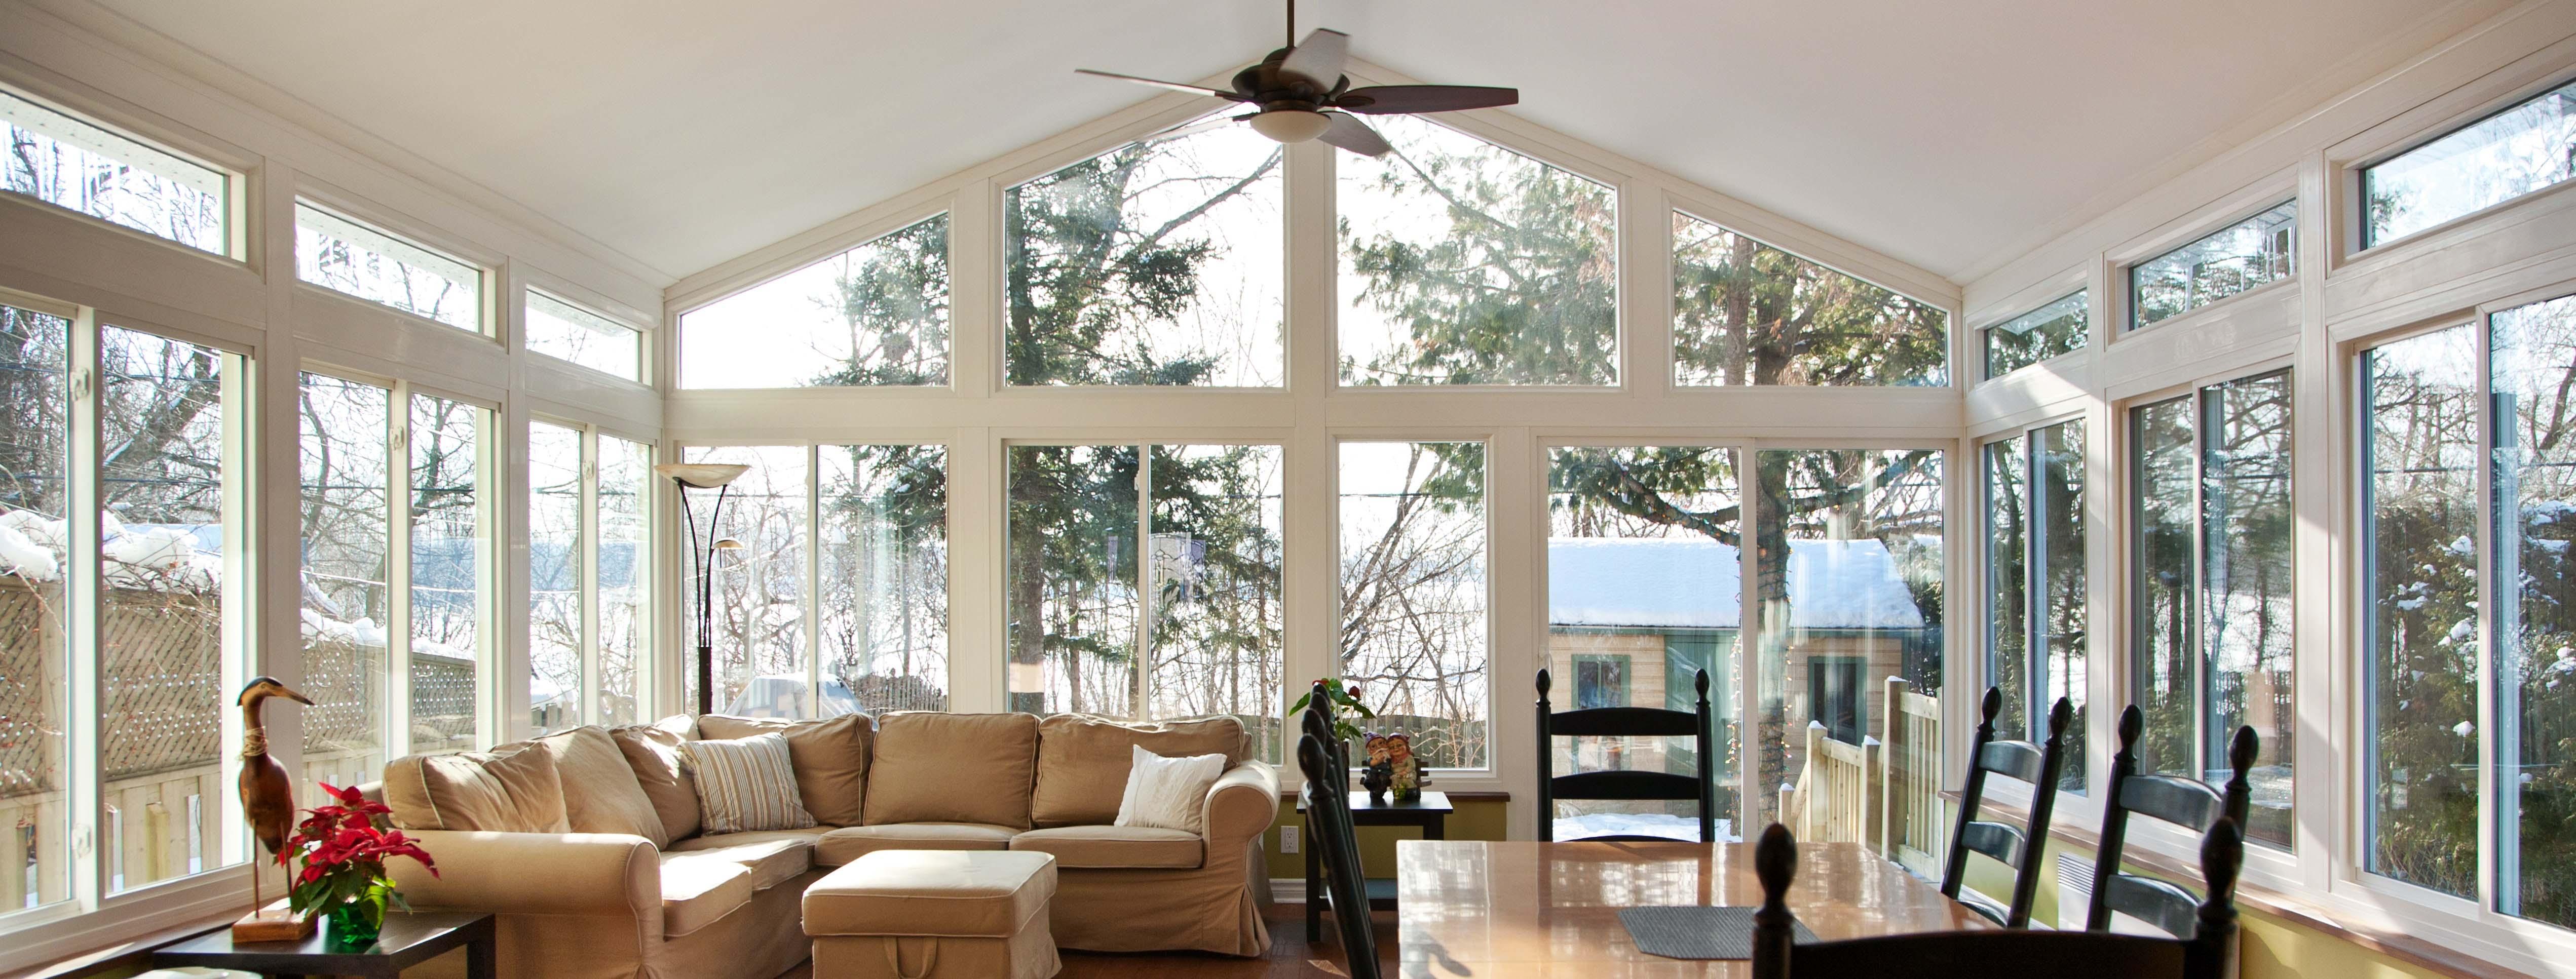 NJ Sunroom Builder Top Local New Jersey Sunroom Company building luxury custom sunroom additions